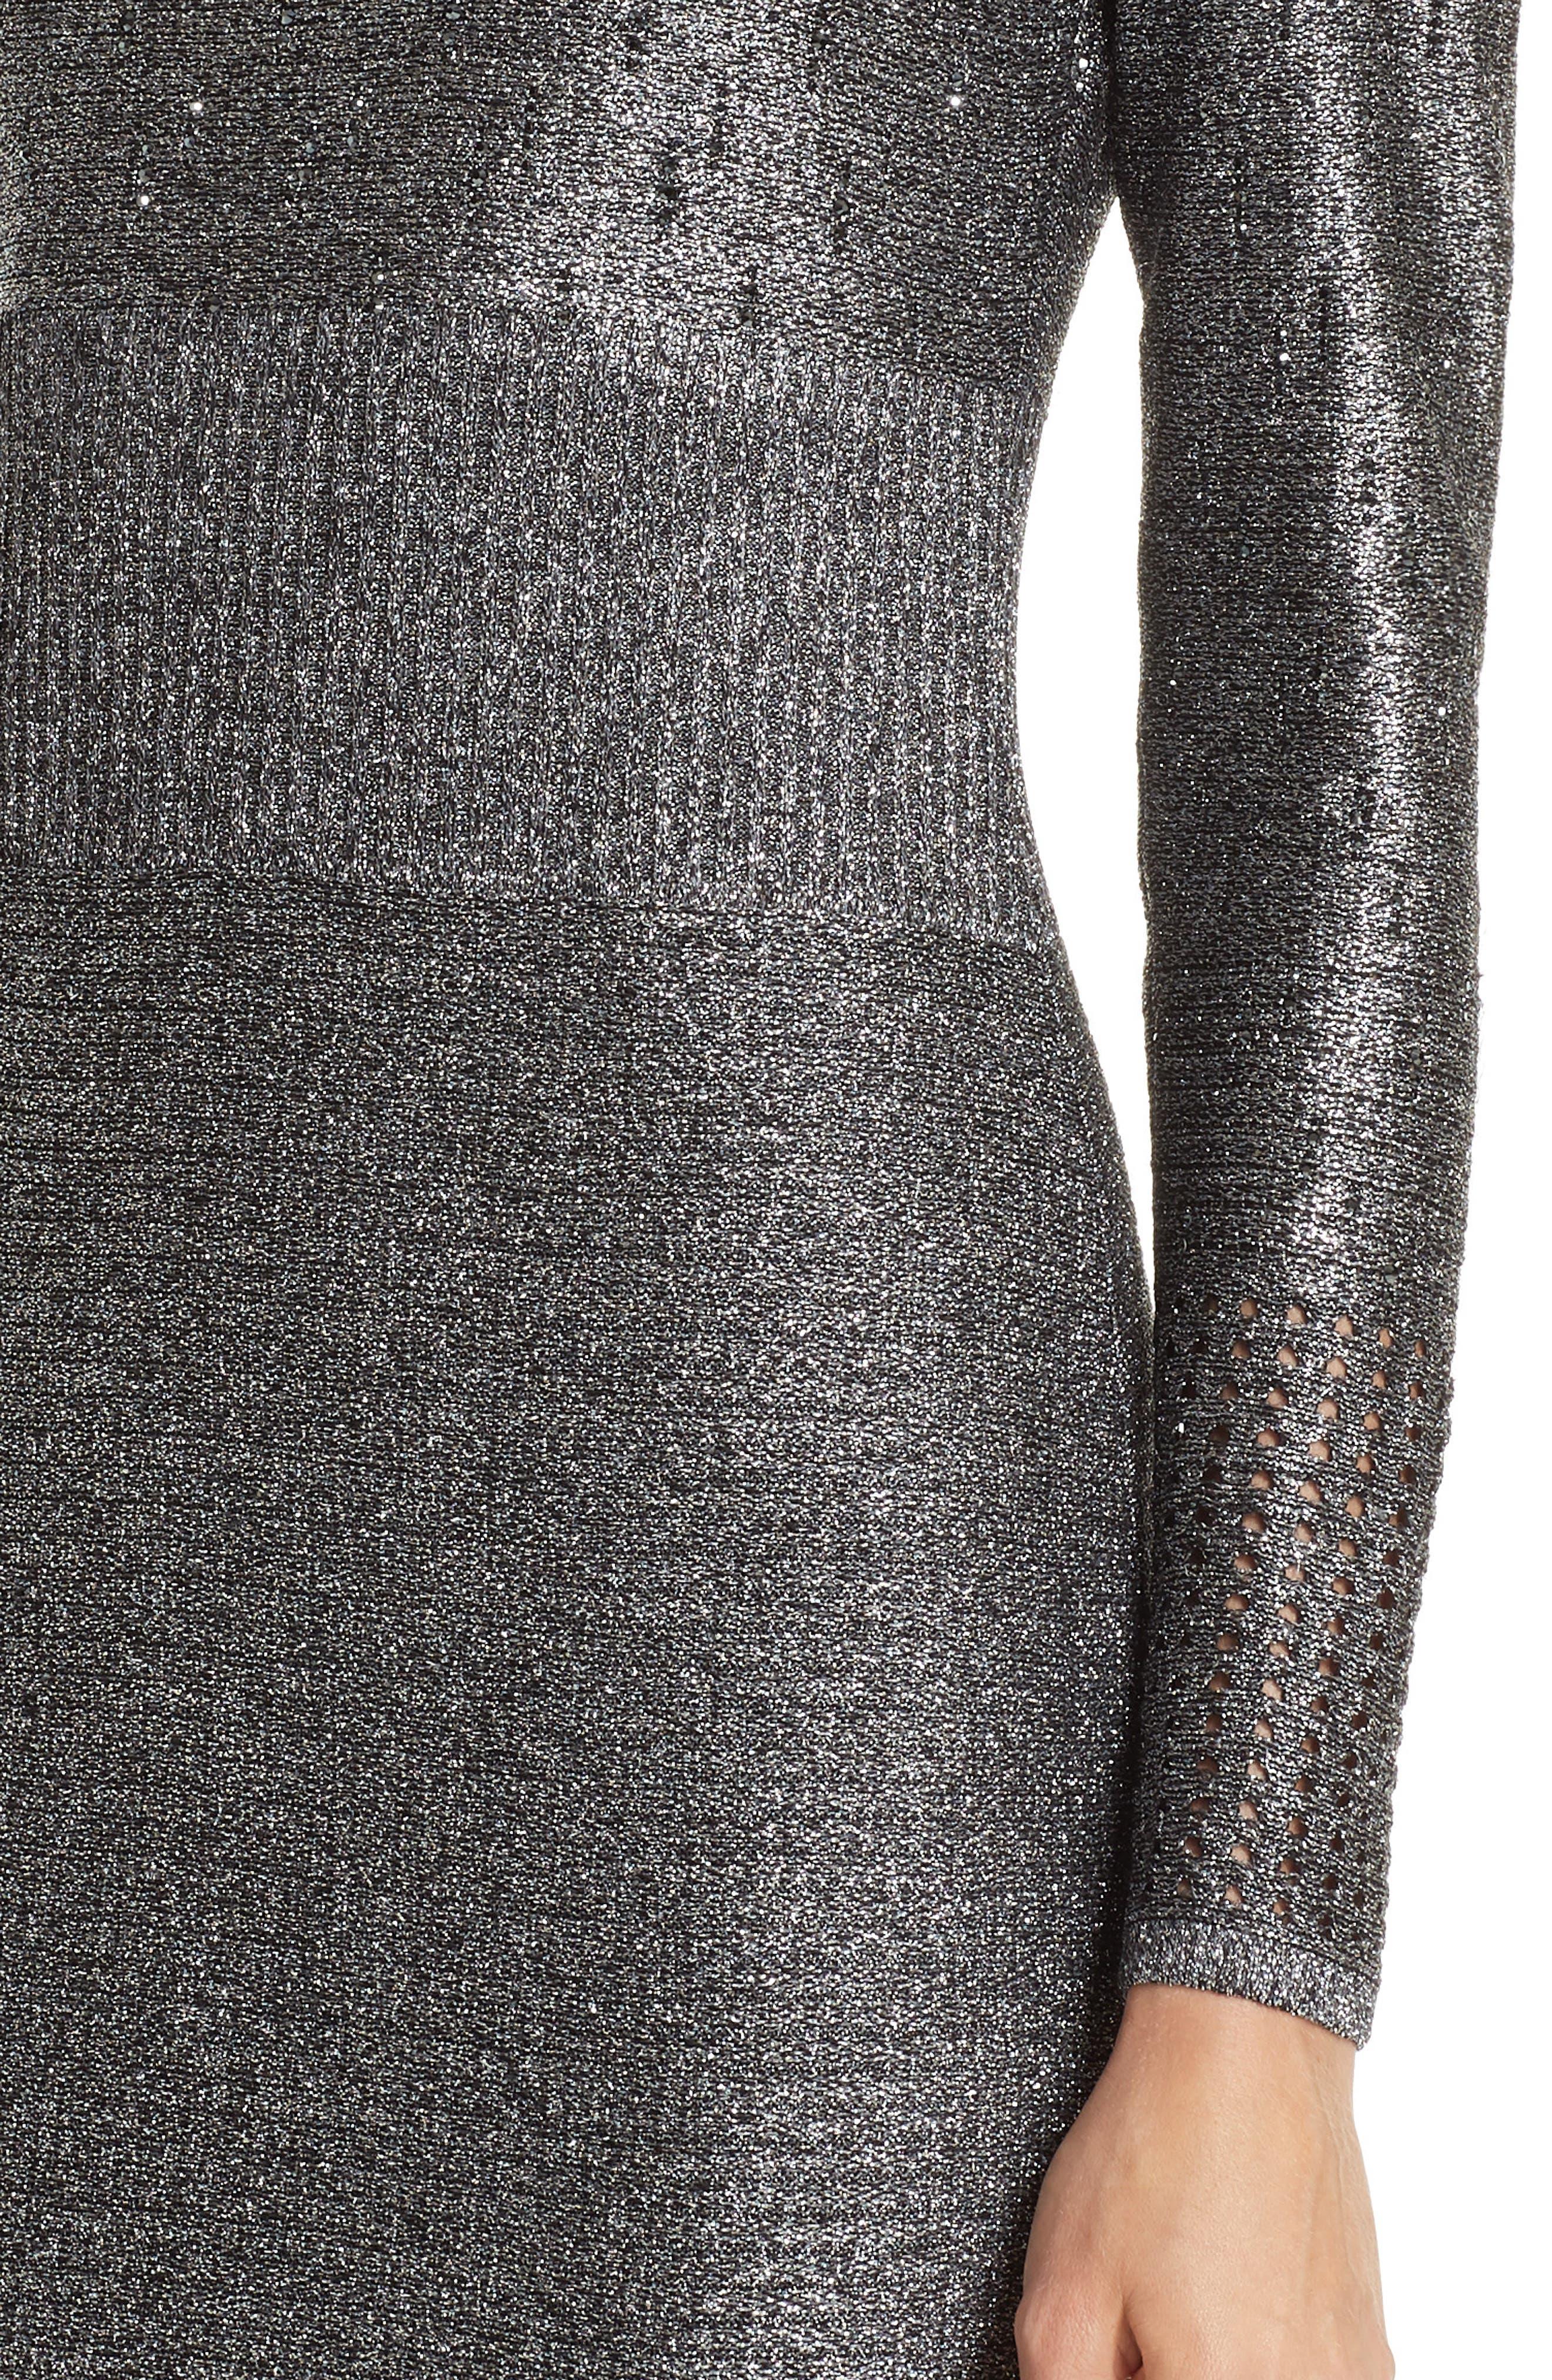 ST. JOHN COLLECTION, Metallic Plaited Mixed Knit Gown, Alternate thumbnail 4, color, GUNMETAL/ CAVIAR